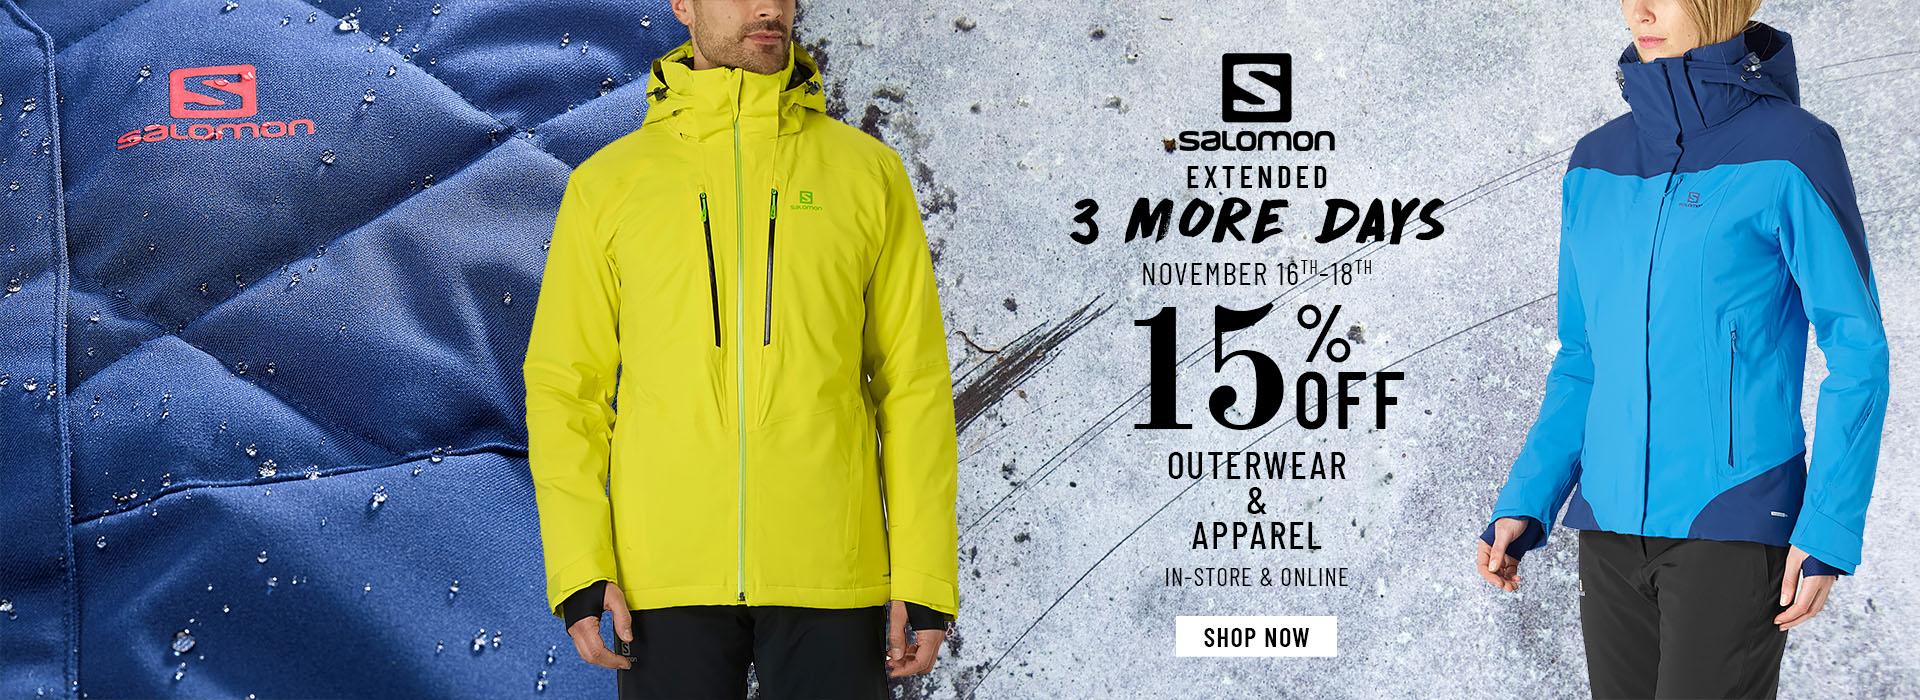 Salomon-outerwear-sale